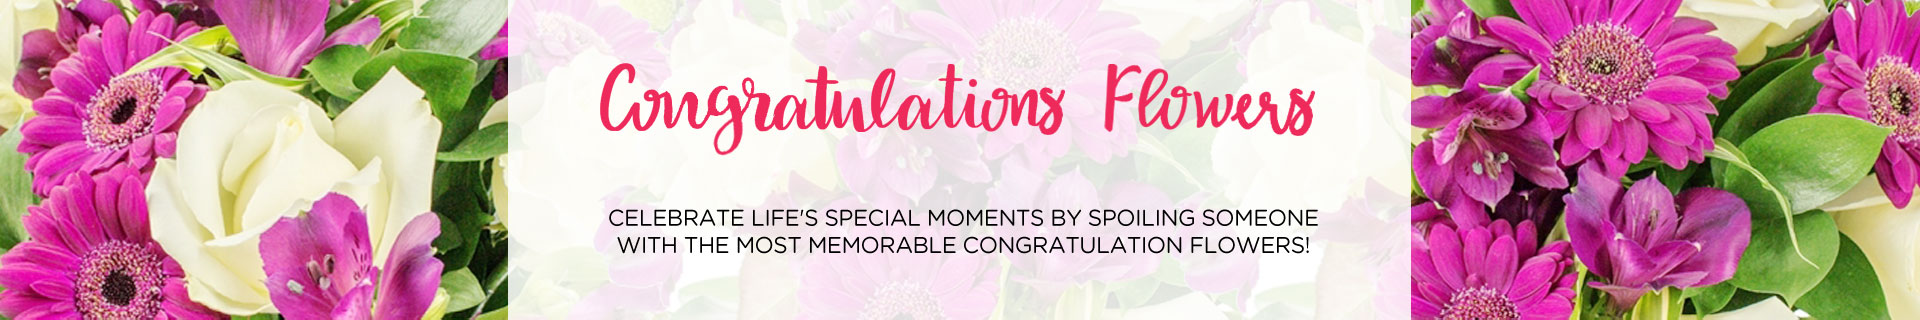 Congratulations Flowers